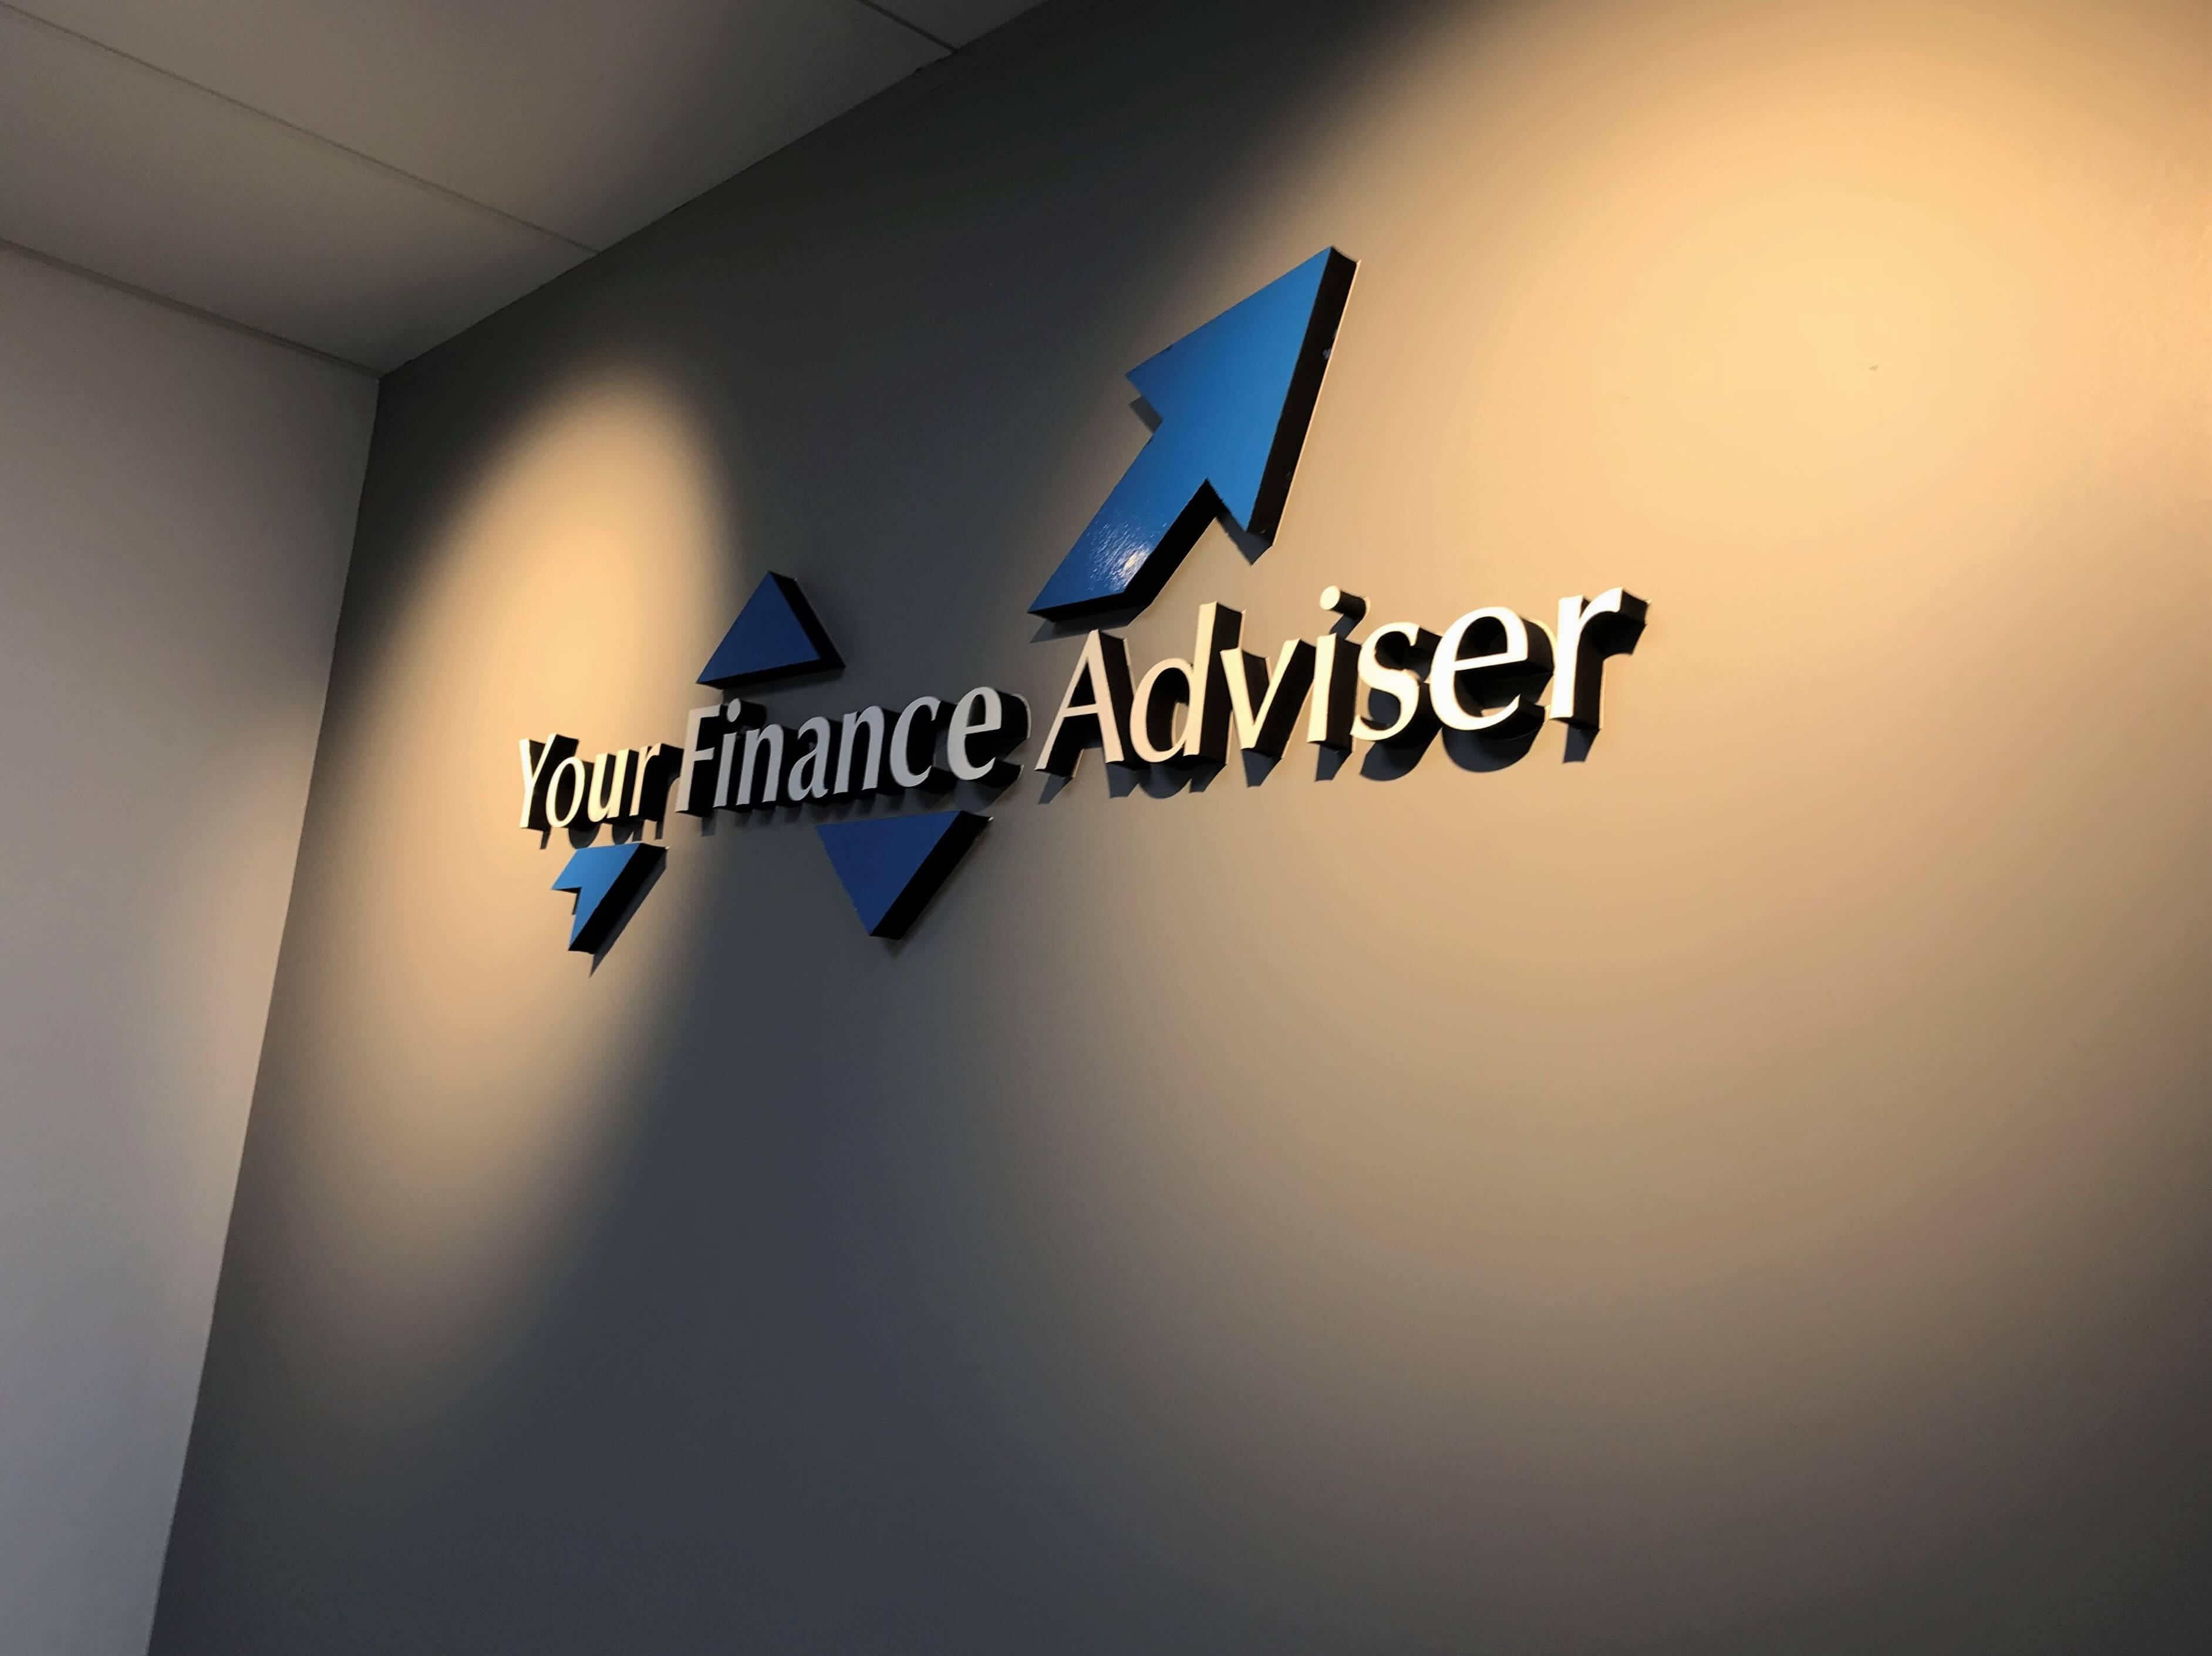 My finance adviser